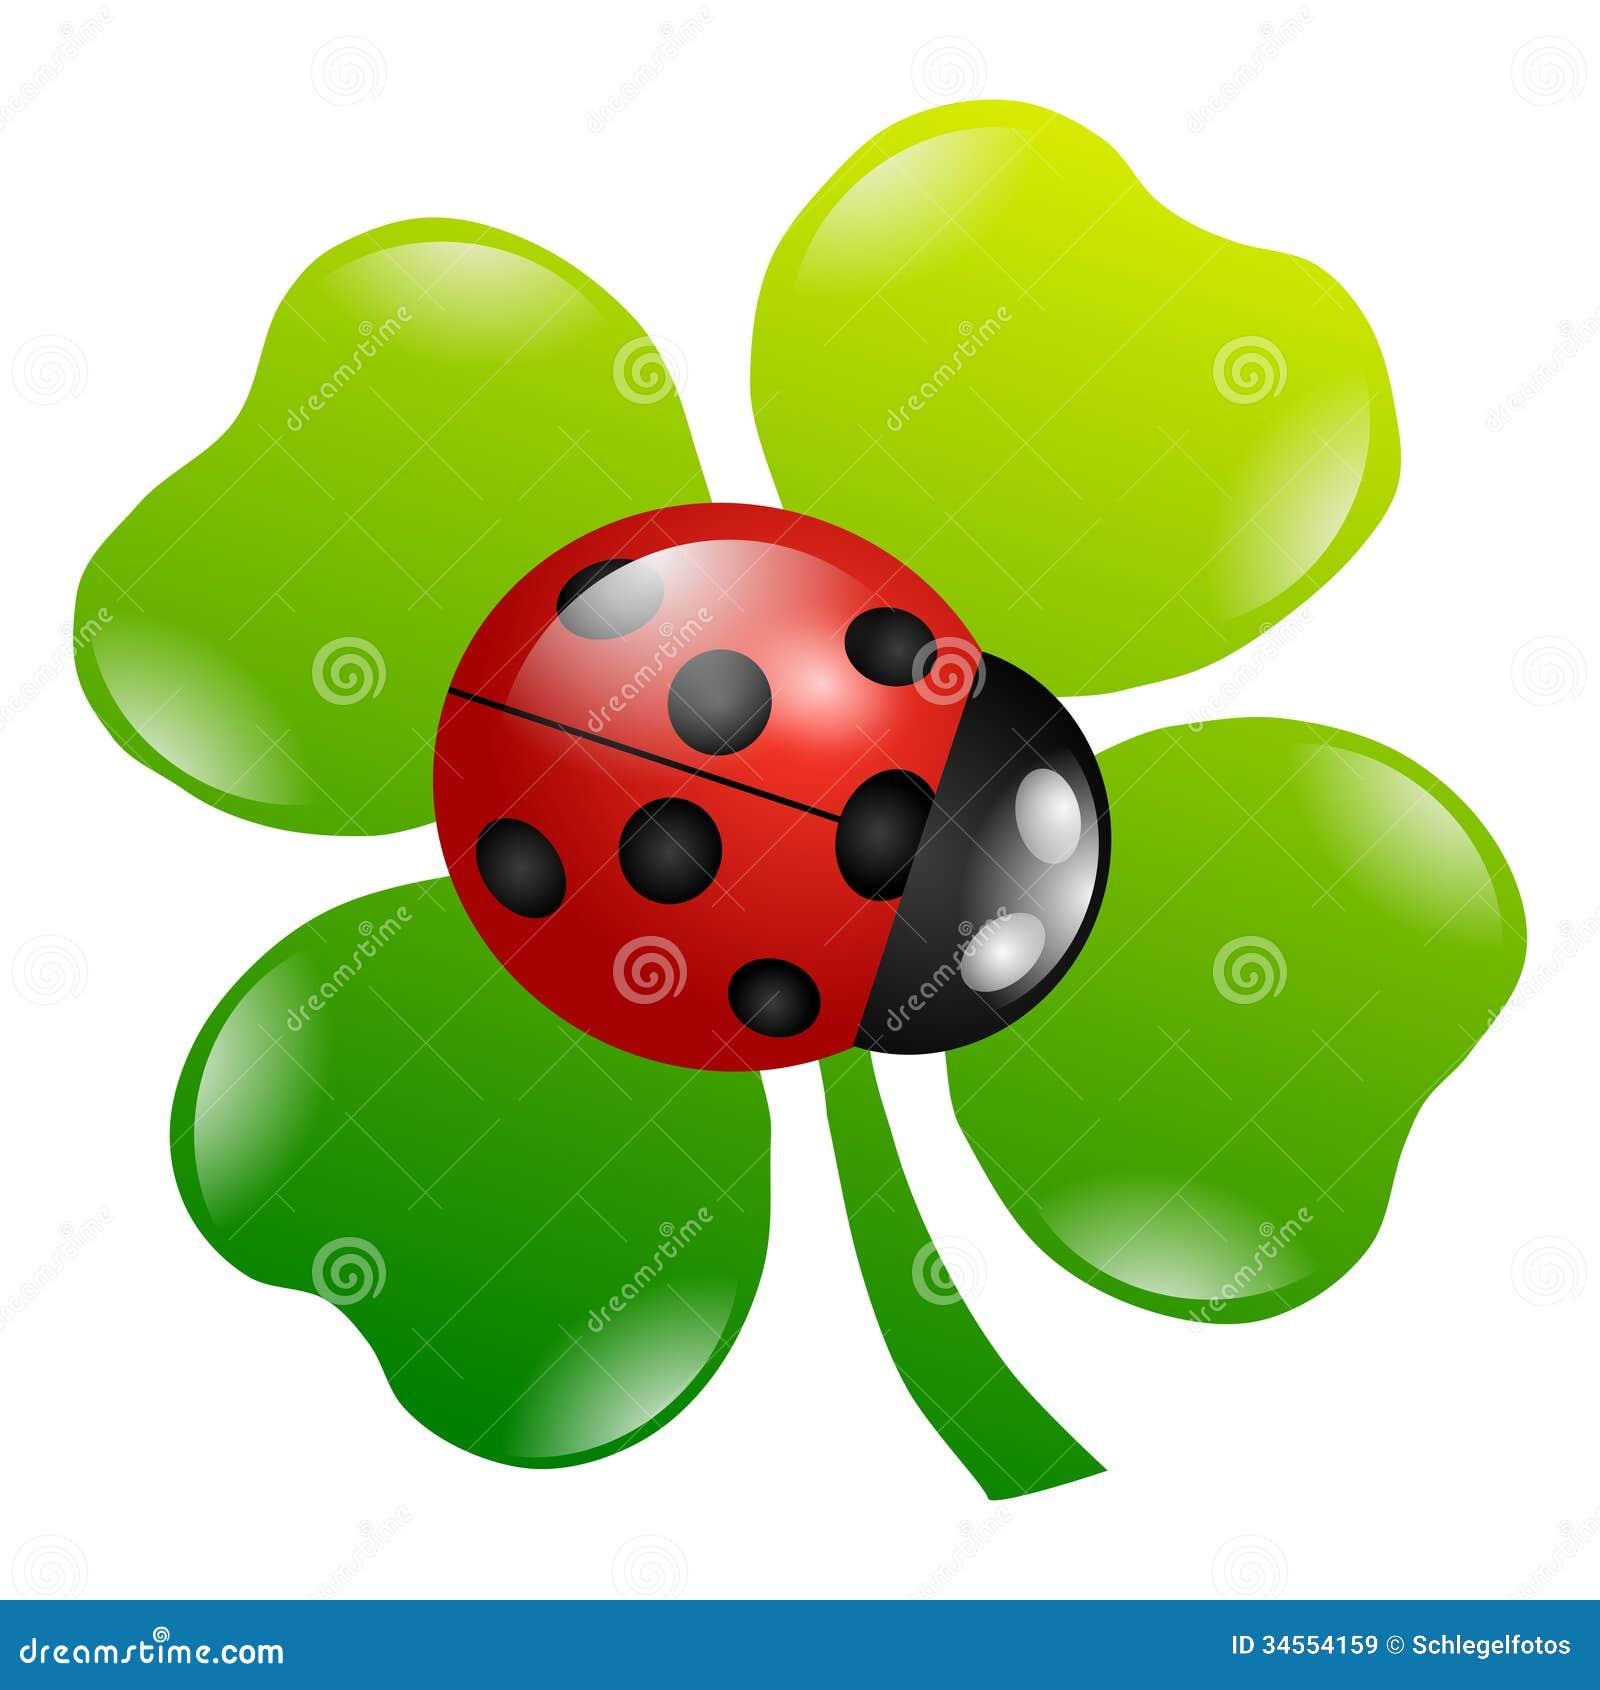 Ein Grünes Kleeblatt Stockbild Bild Von Vier Nave Blatt 34554159